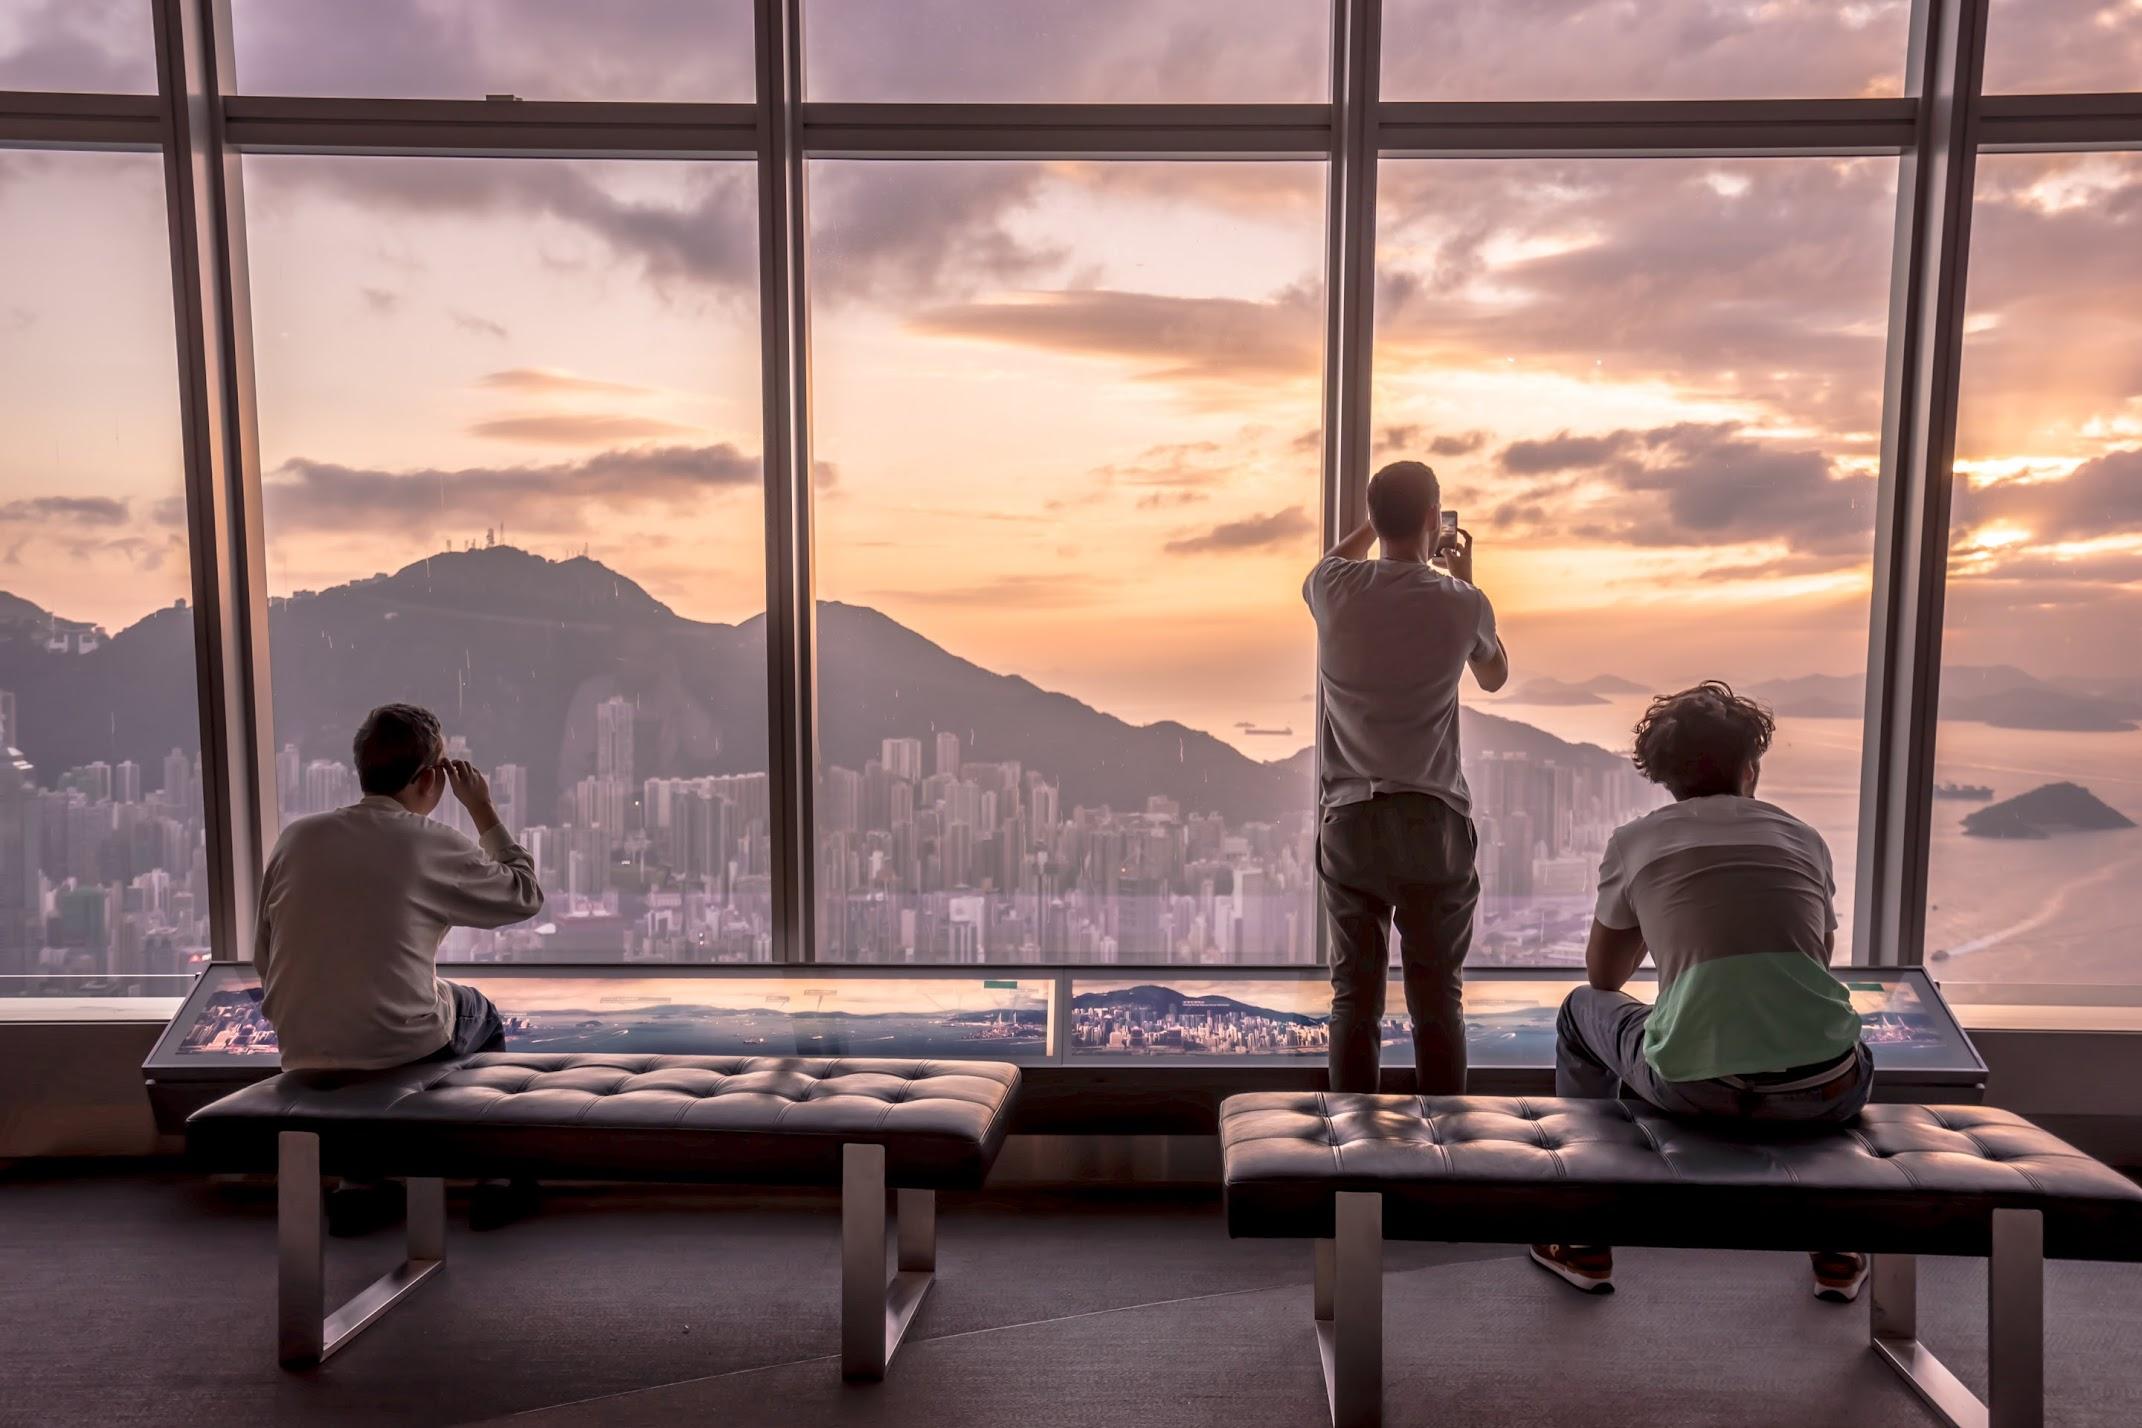 Hong Kong sky100 (天際100) evening3